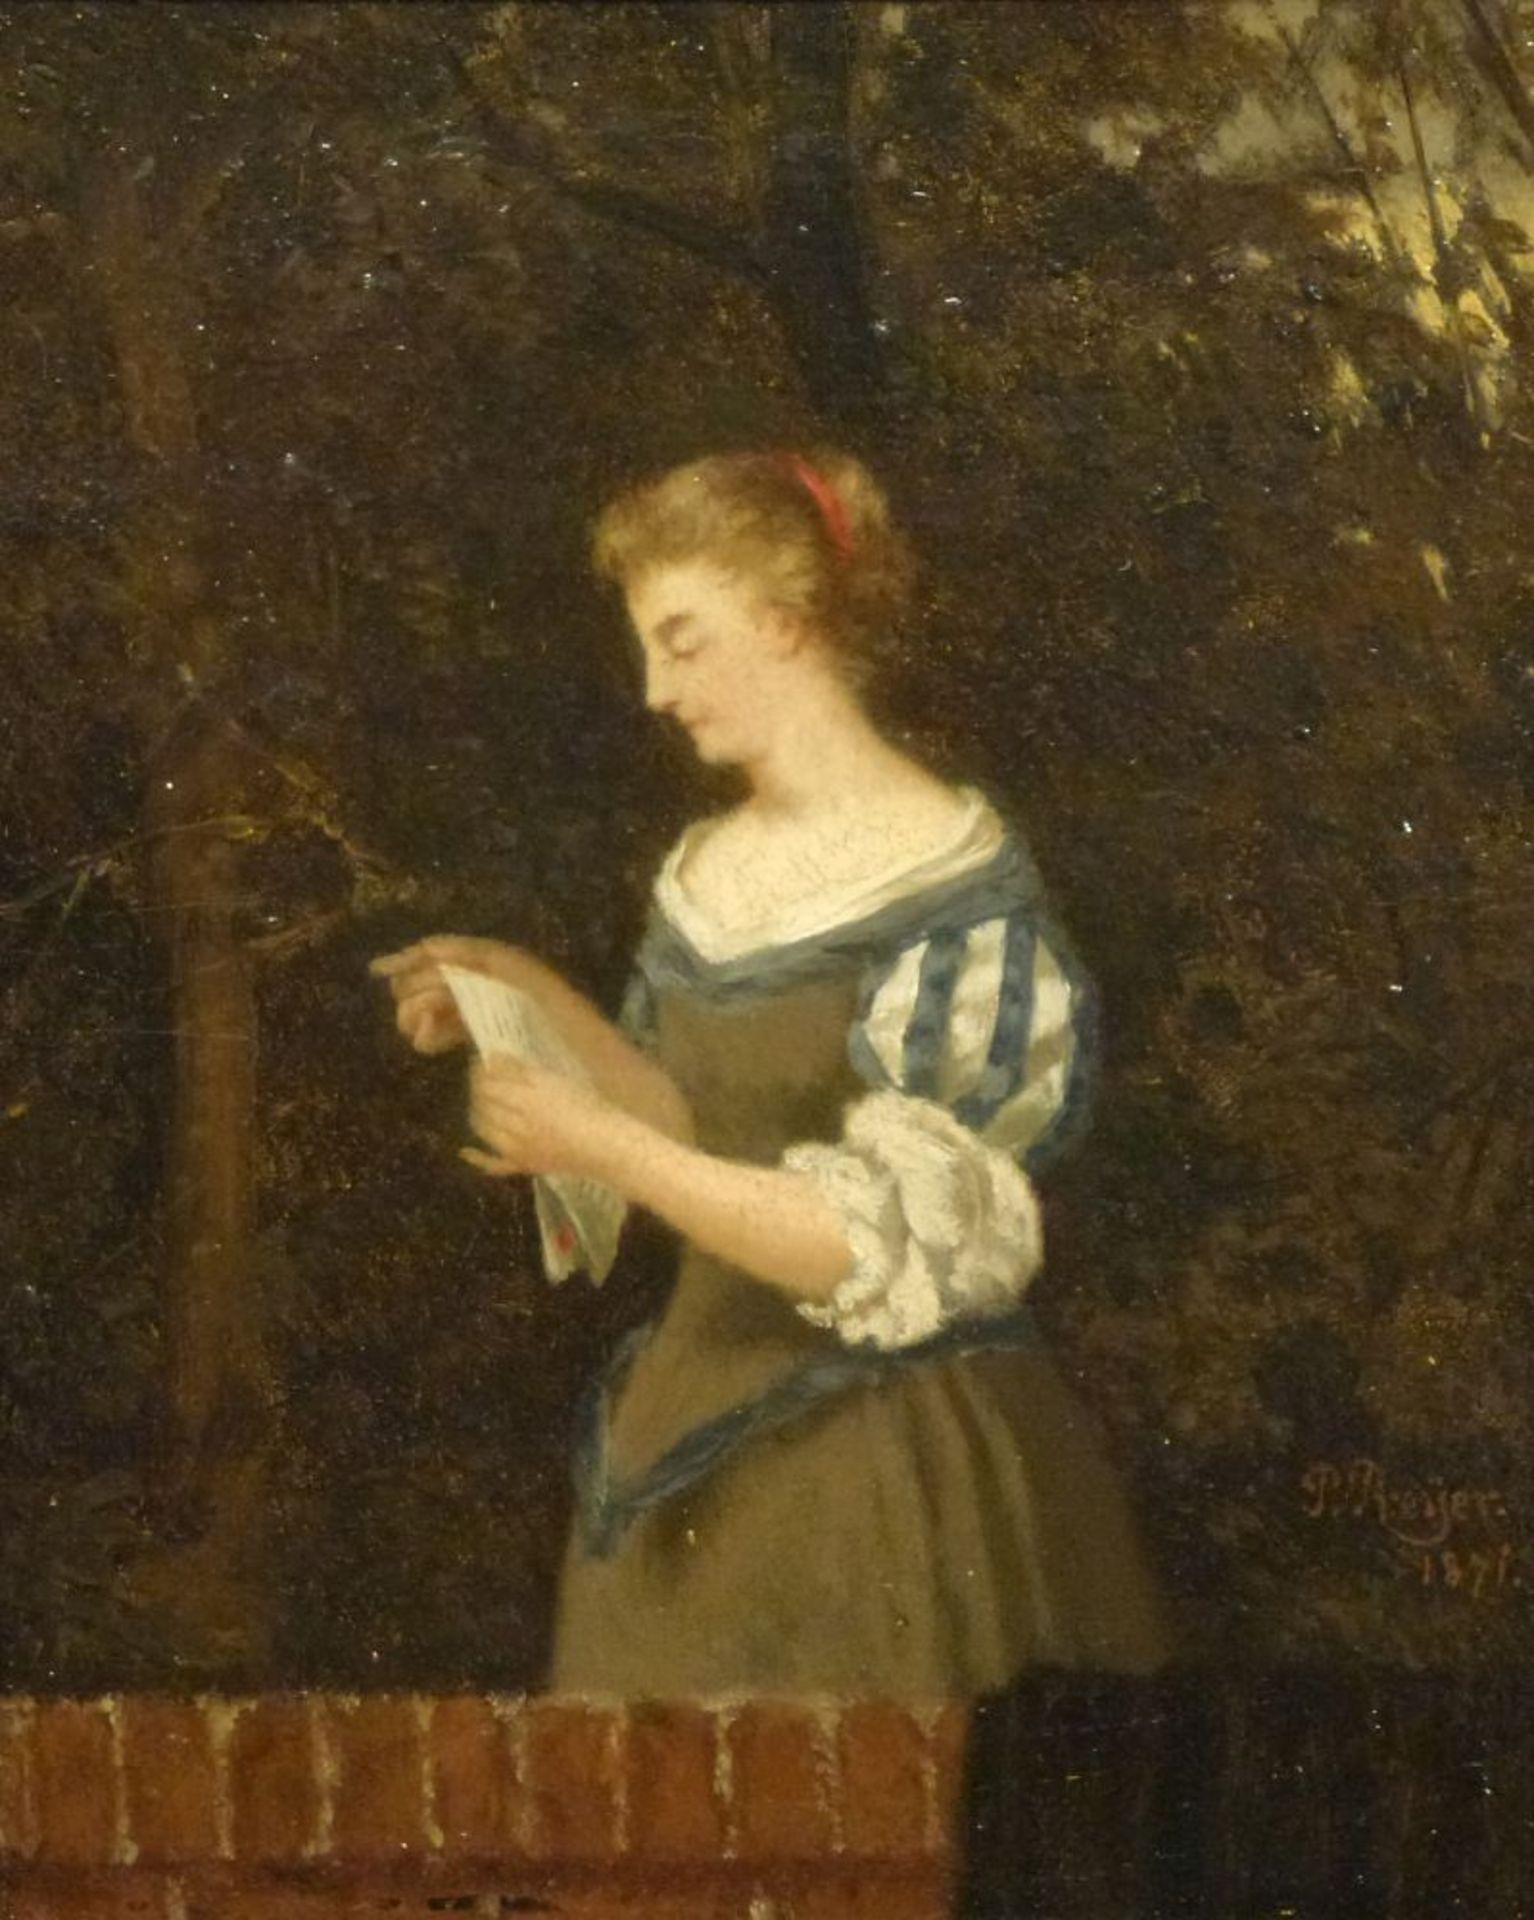 Los 49 - Der BriefPaul Preyer, 1847-1931?Öl/Mahagonitafel, sign. u. dat. P.Preyer 1871, junge Frau hinter